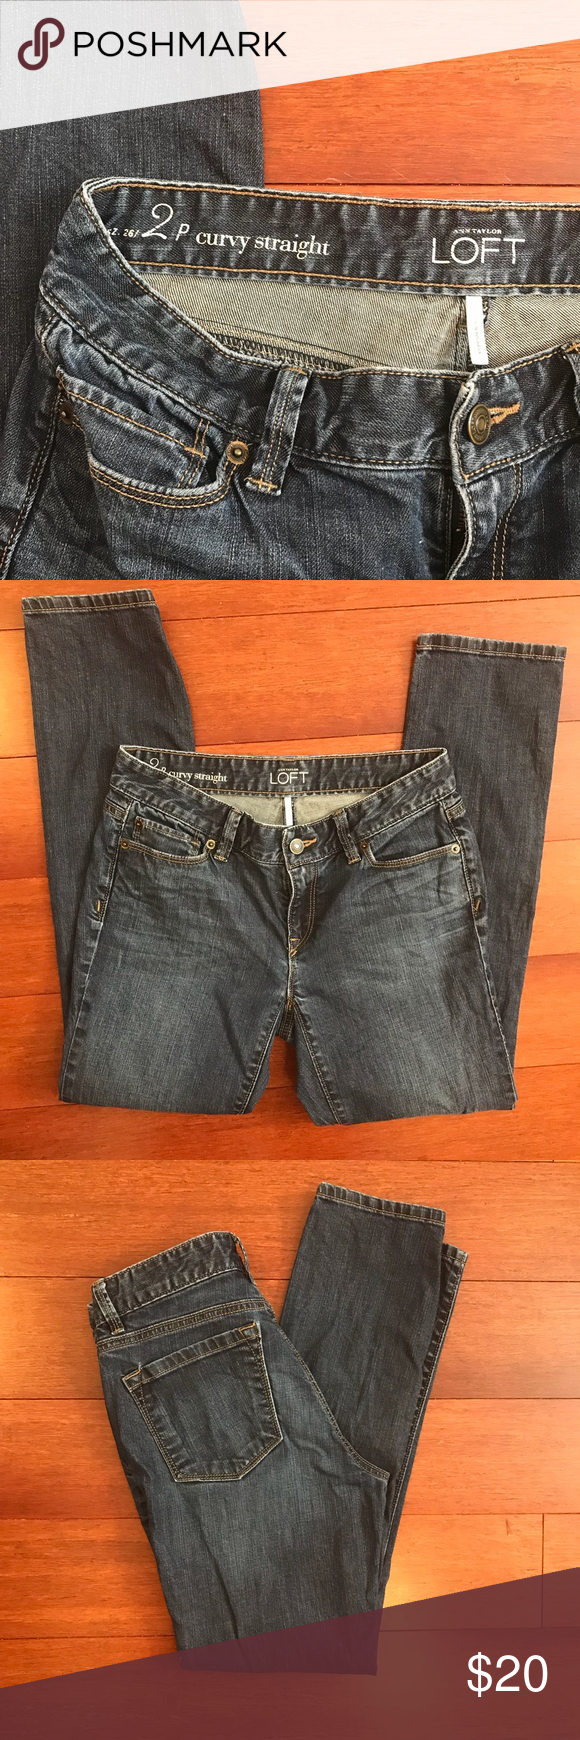 Loft 2p curvy straight jeans Loft 2P Curvy Straight jeans LOFT Jeans Straight Leg